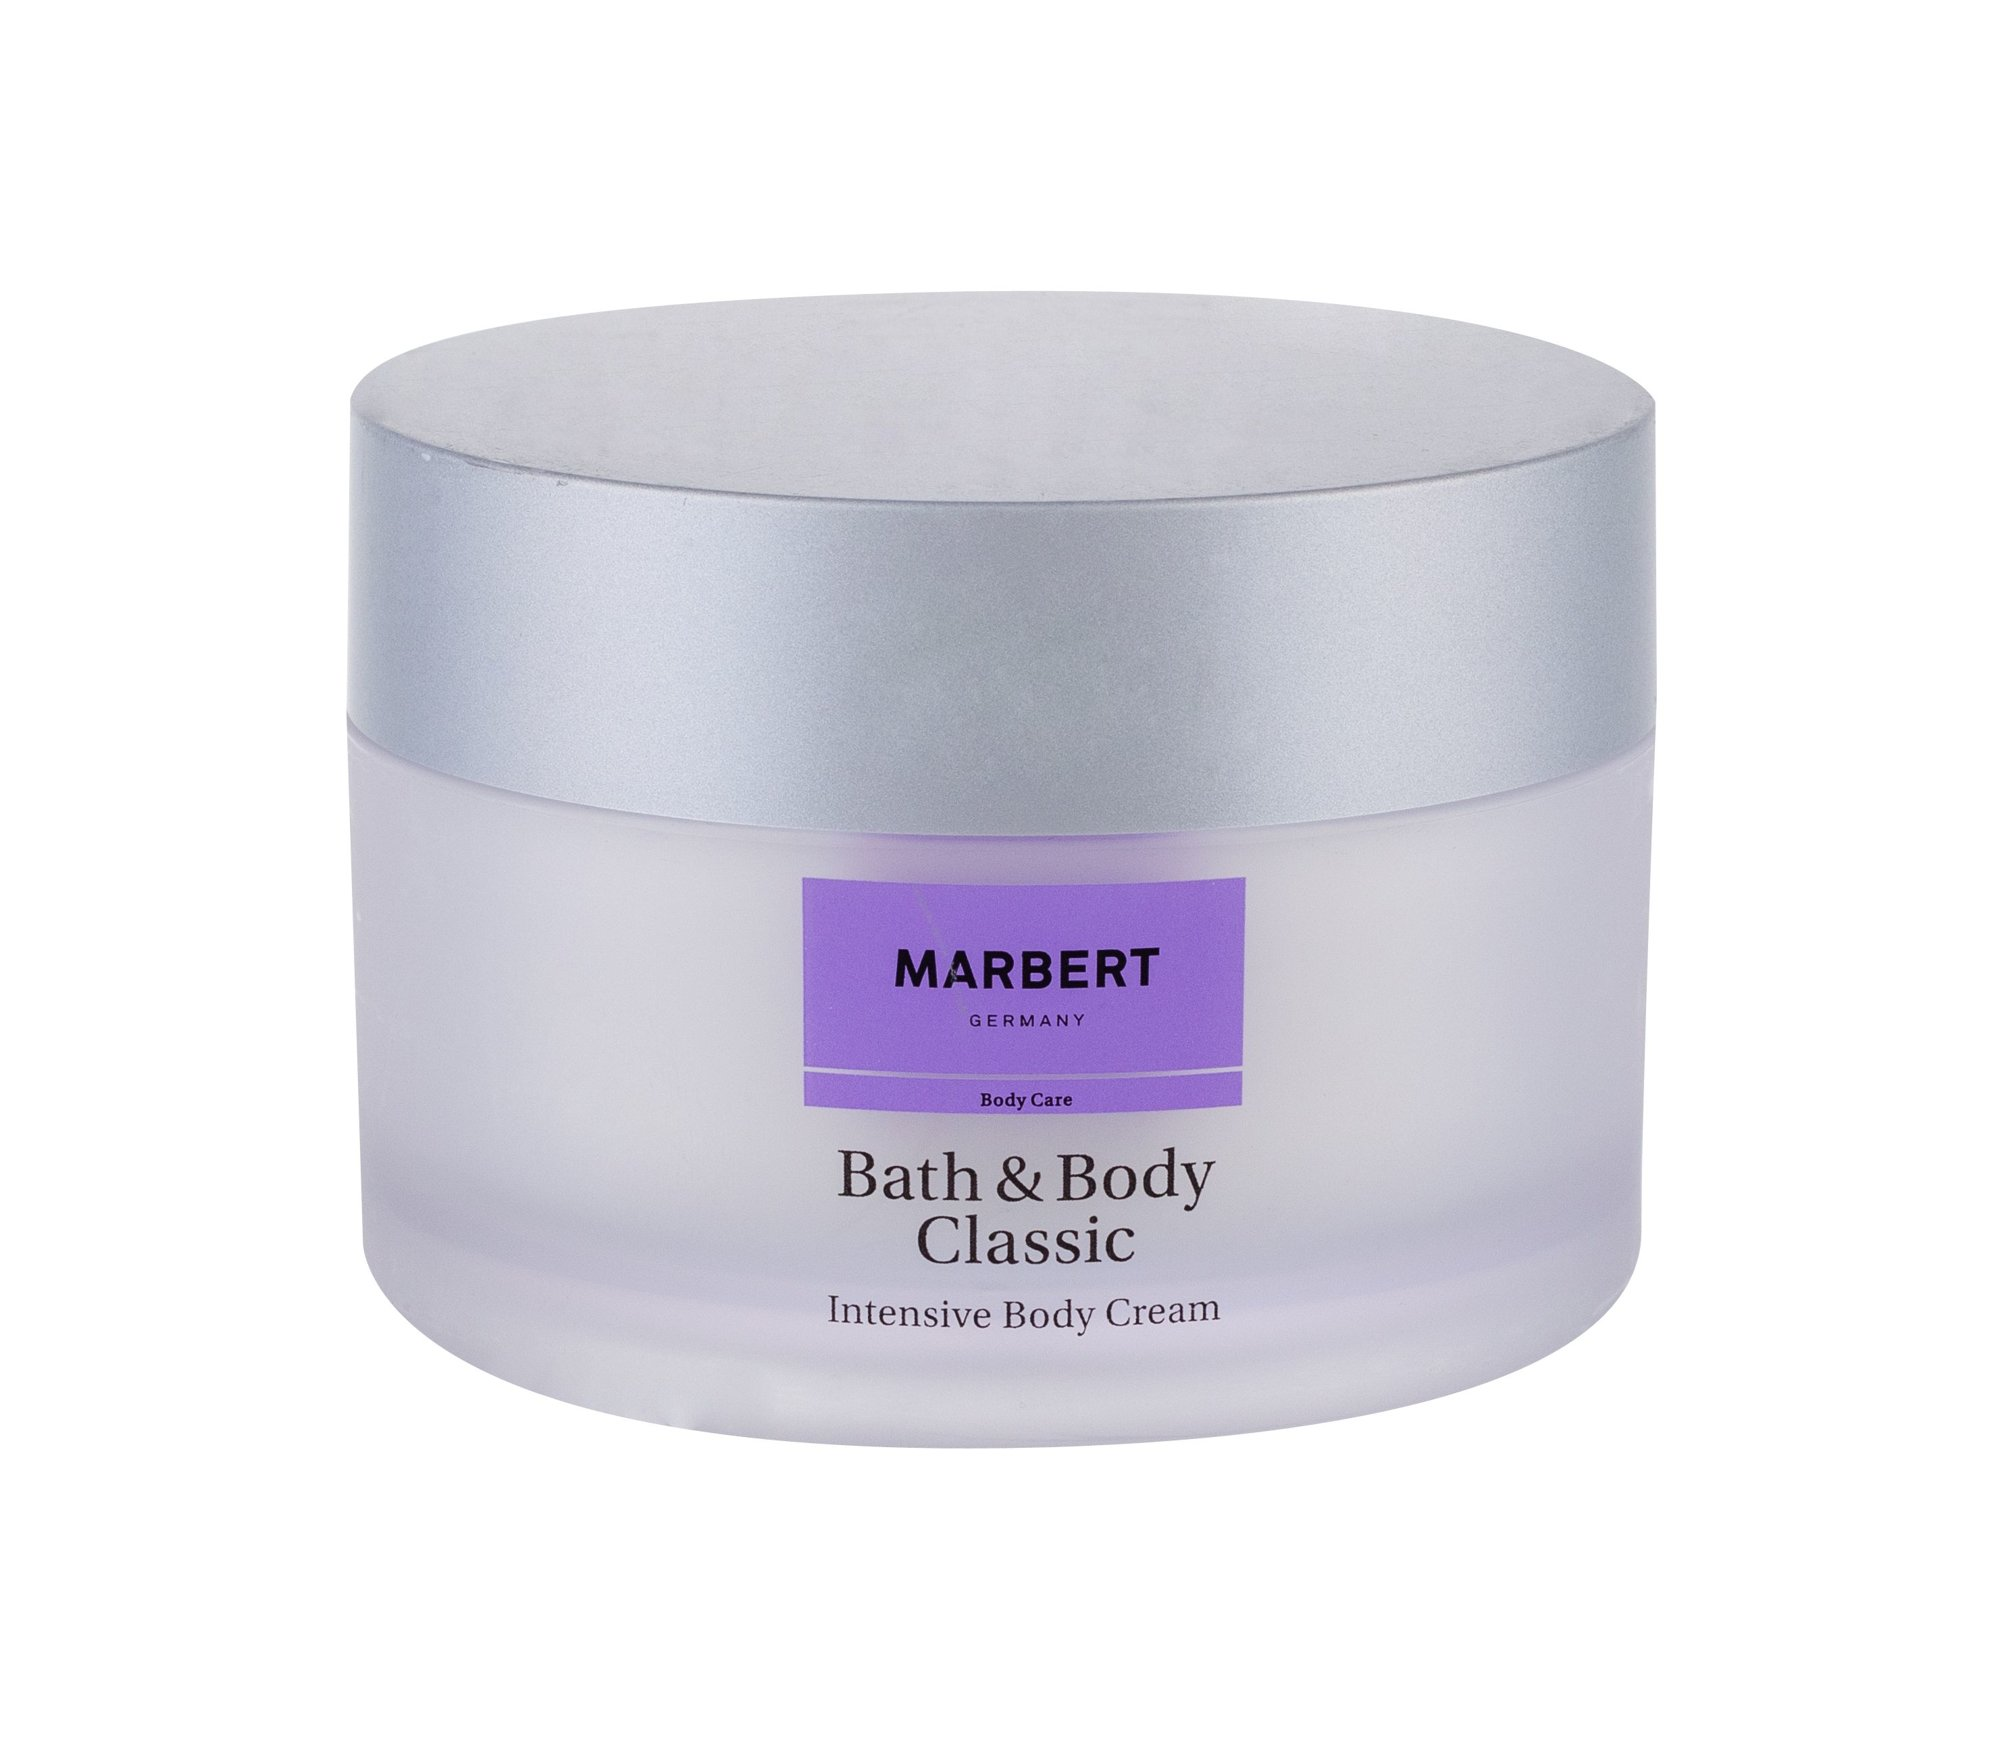 Marbert Bath & Body Classic Body Cream 200ml